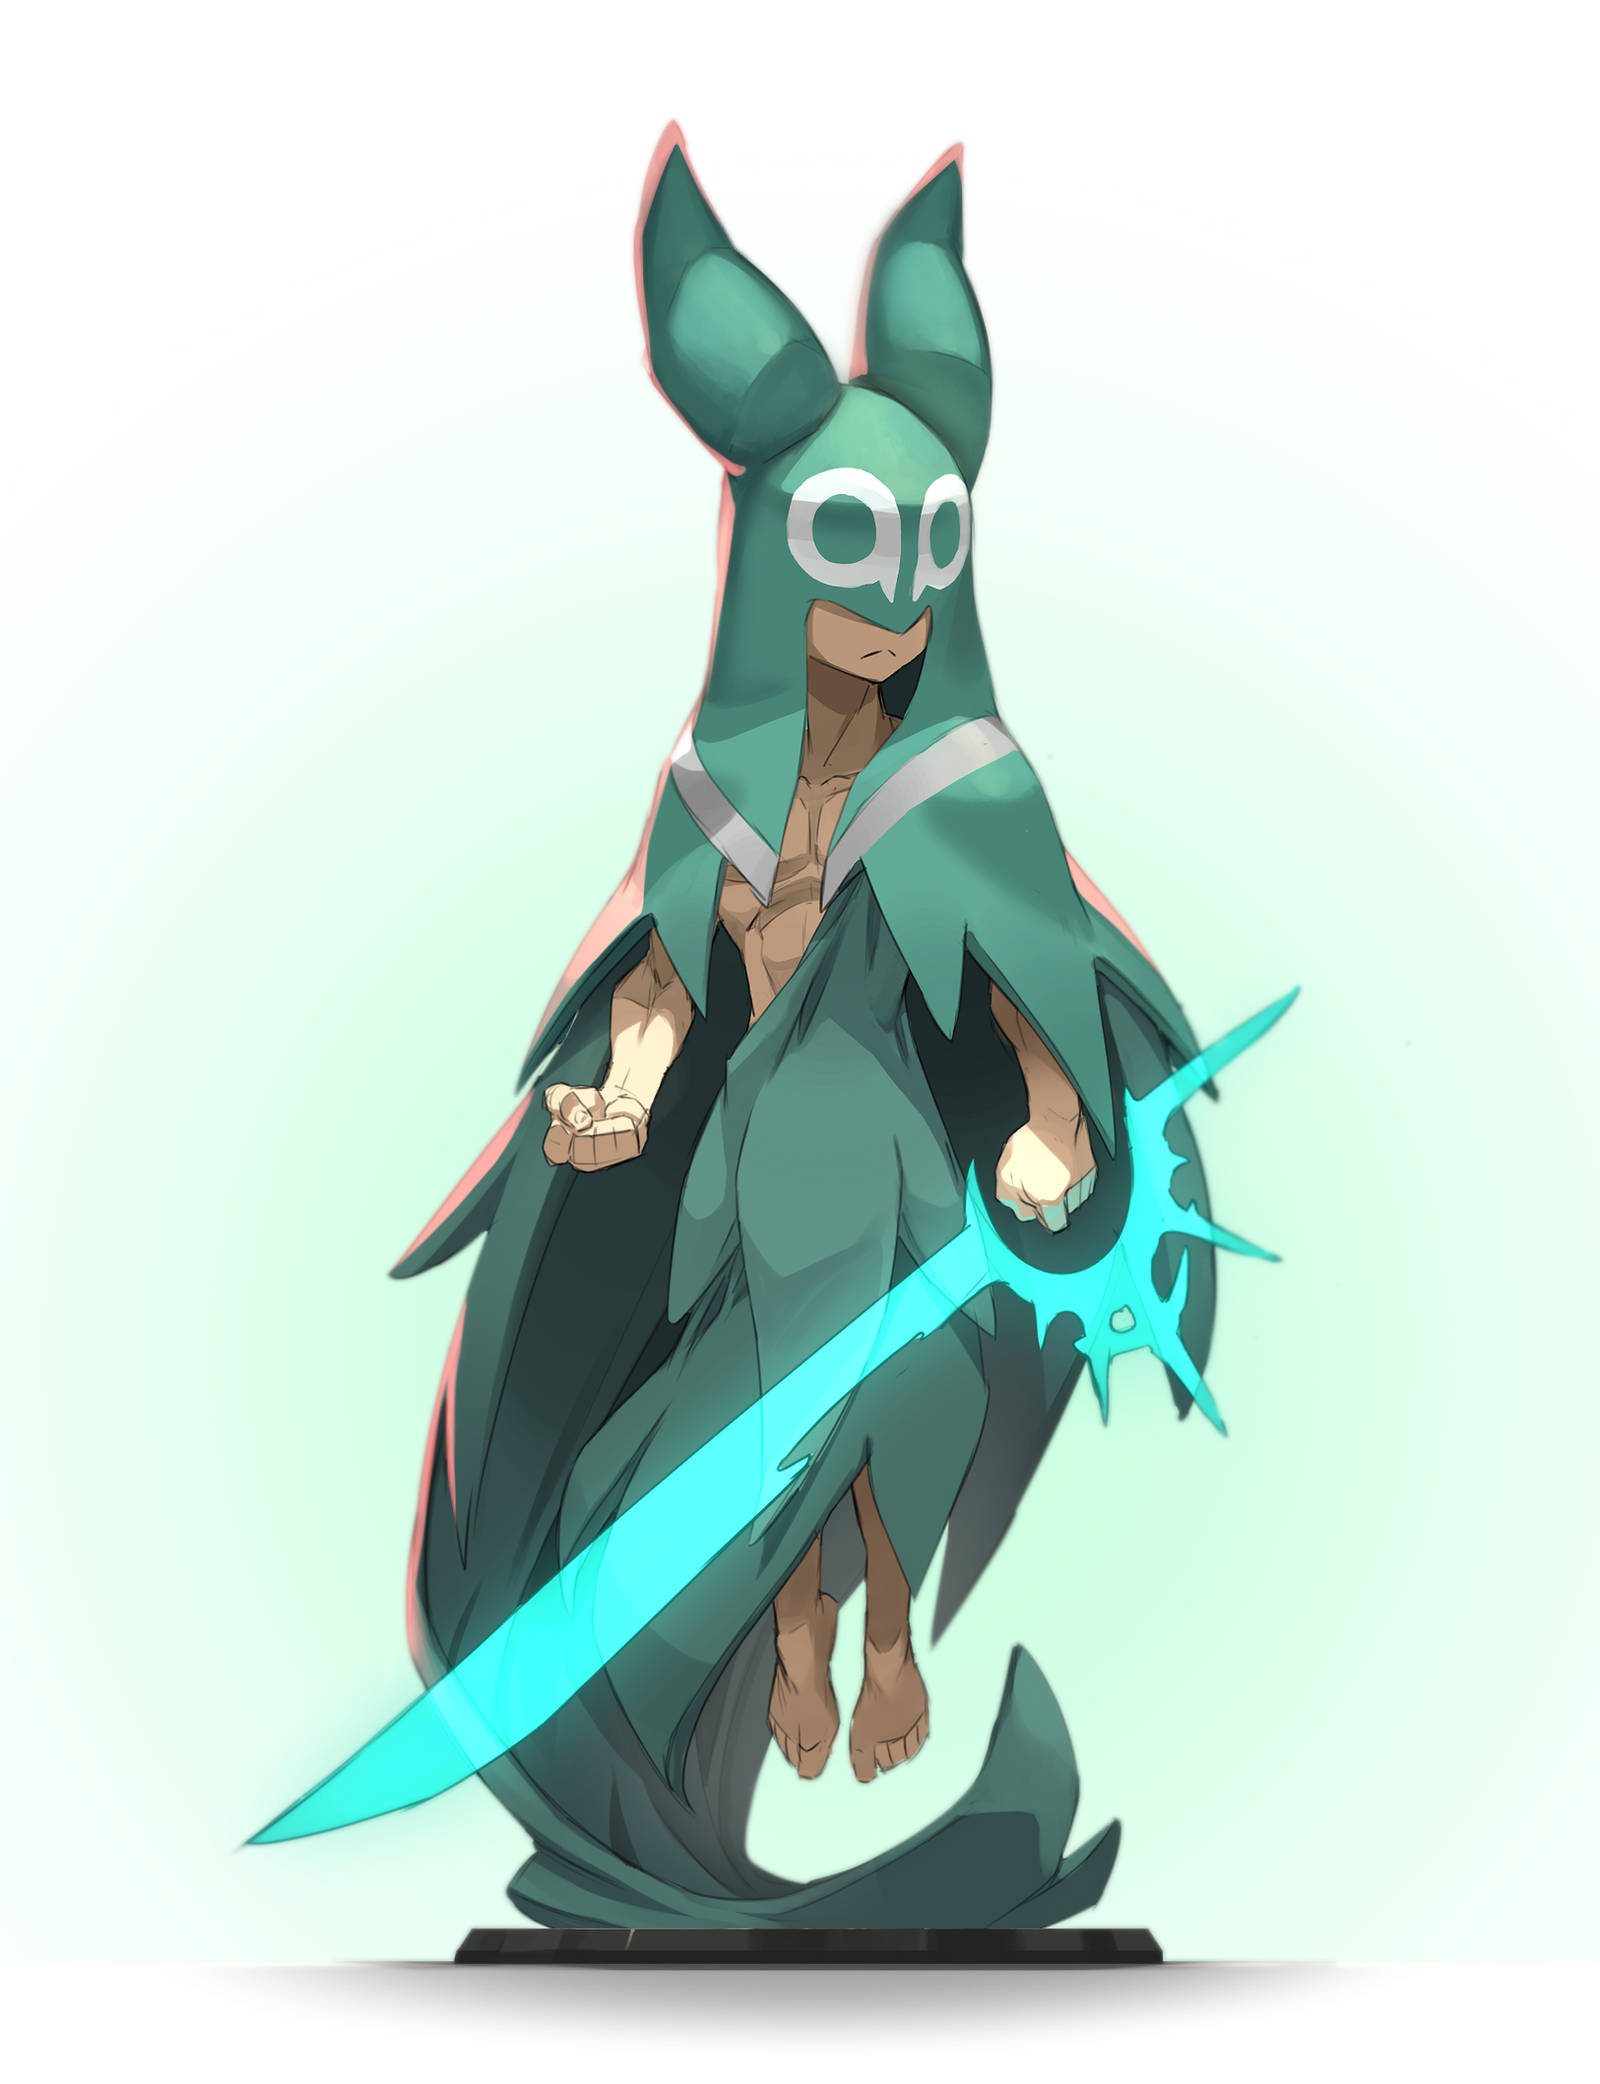 Oropo Figure design by xa-xa-xa